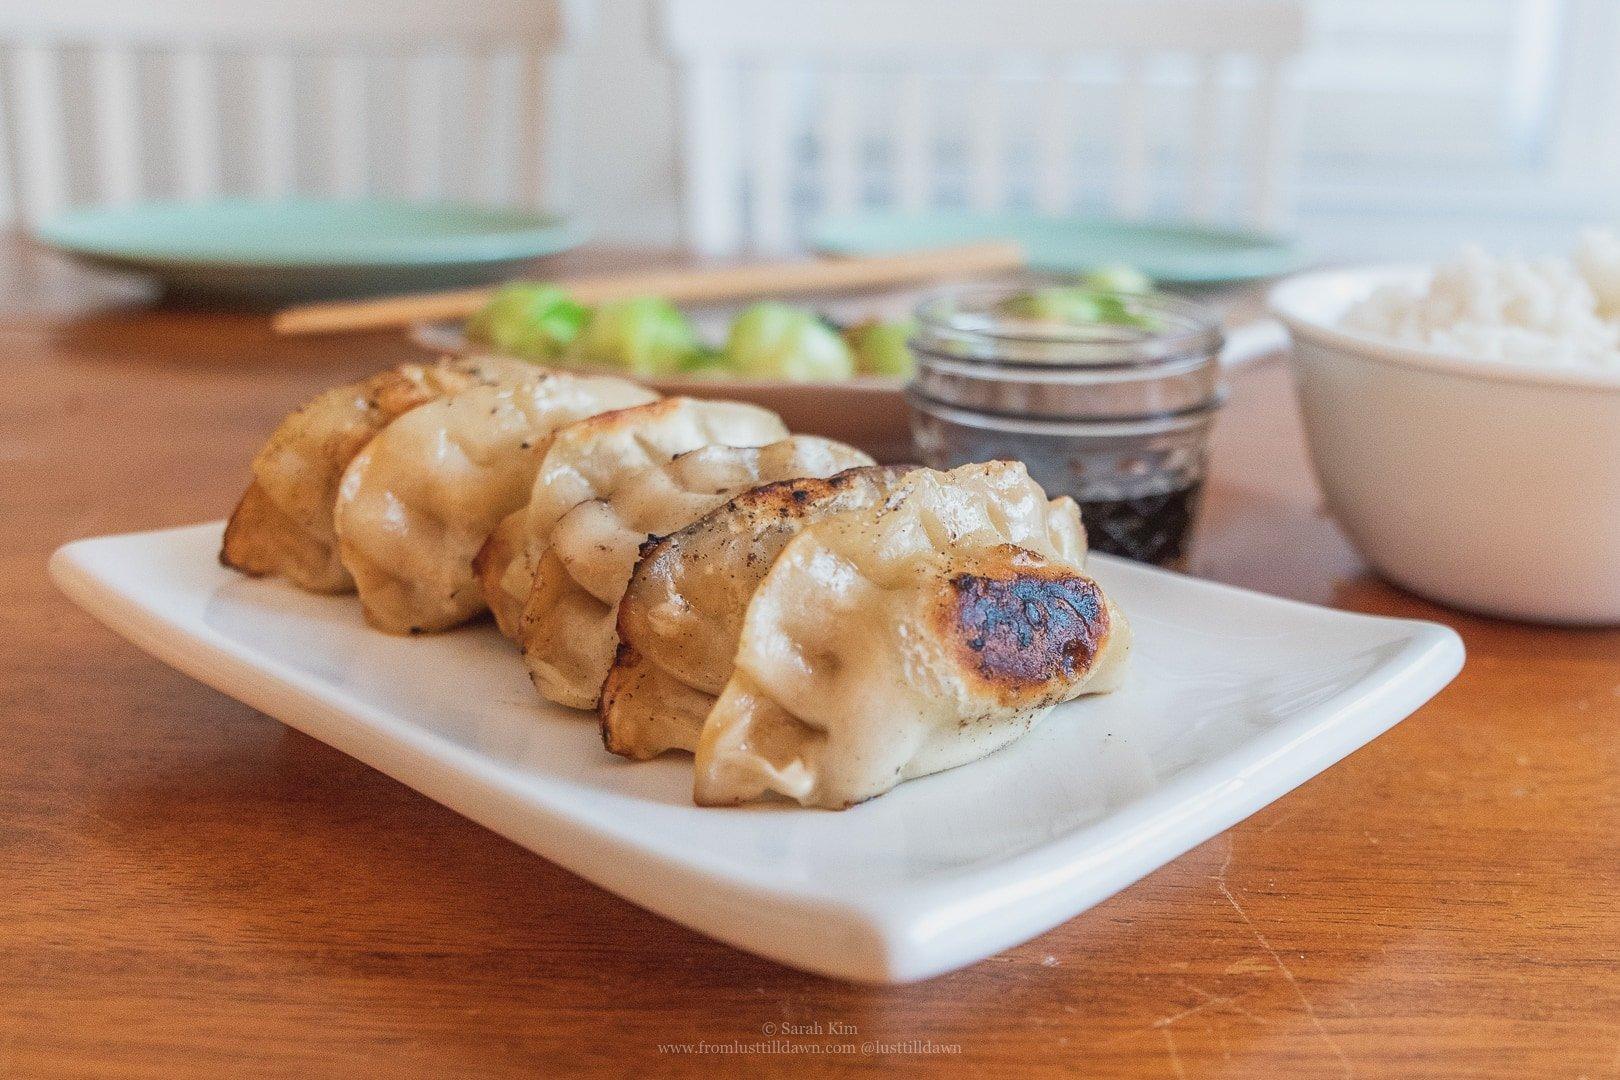 ling ling pork and vegetable dumplings